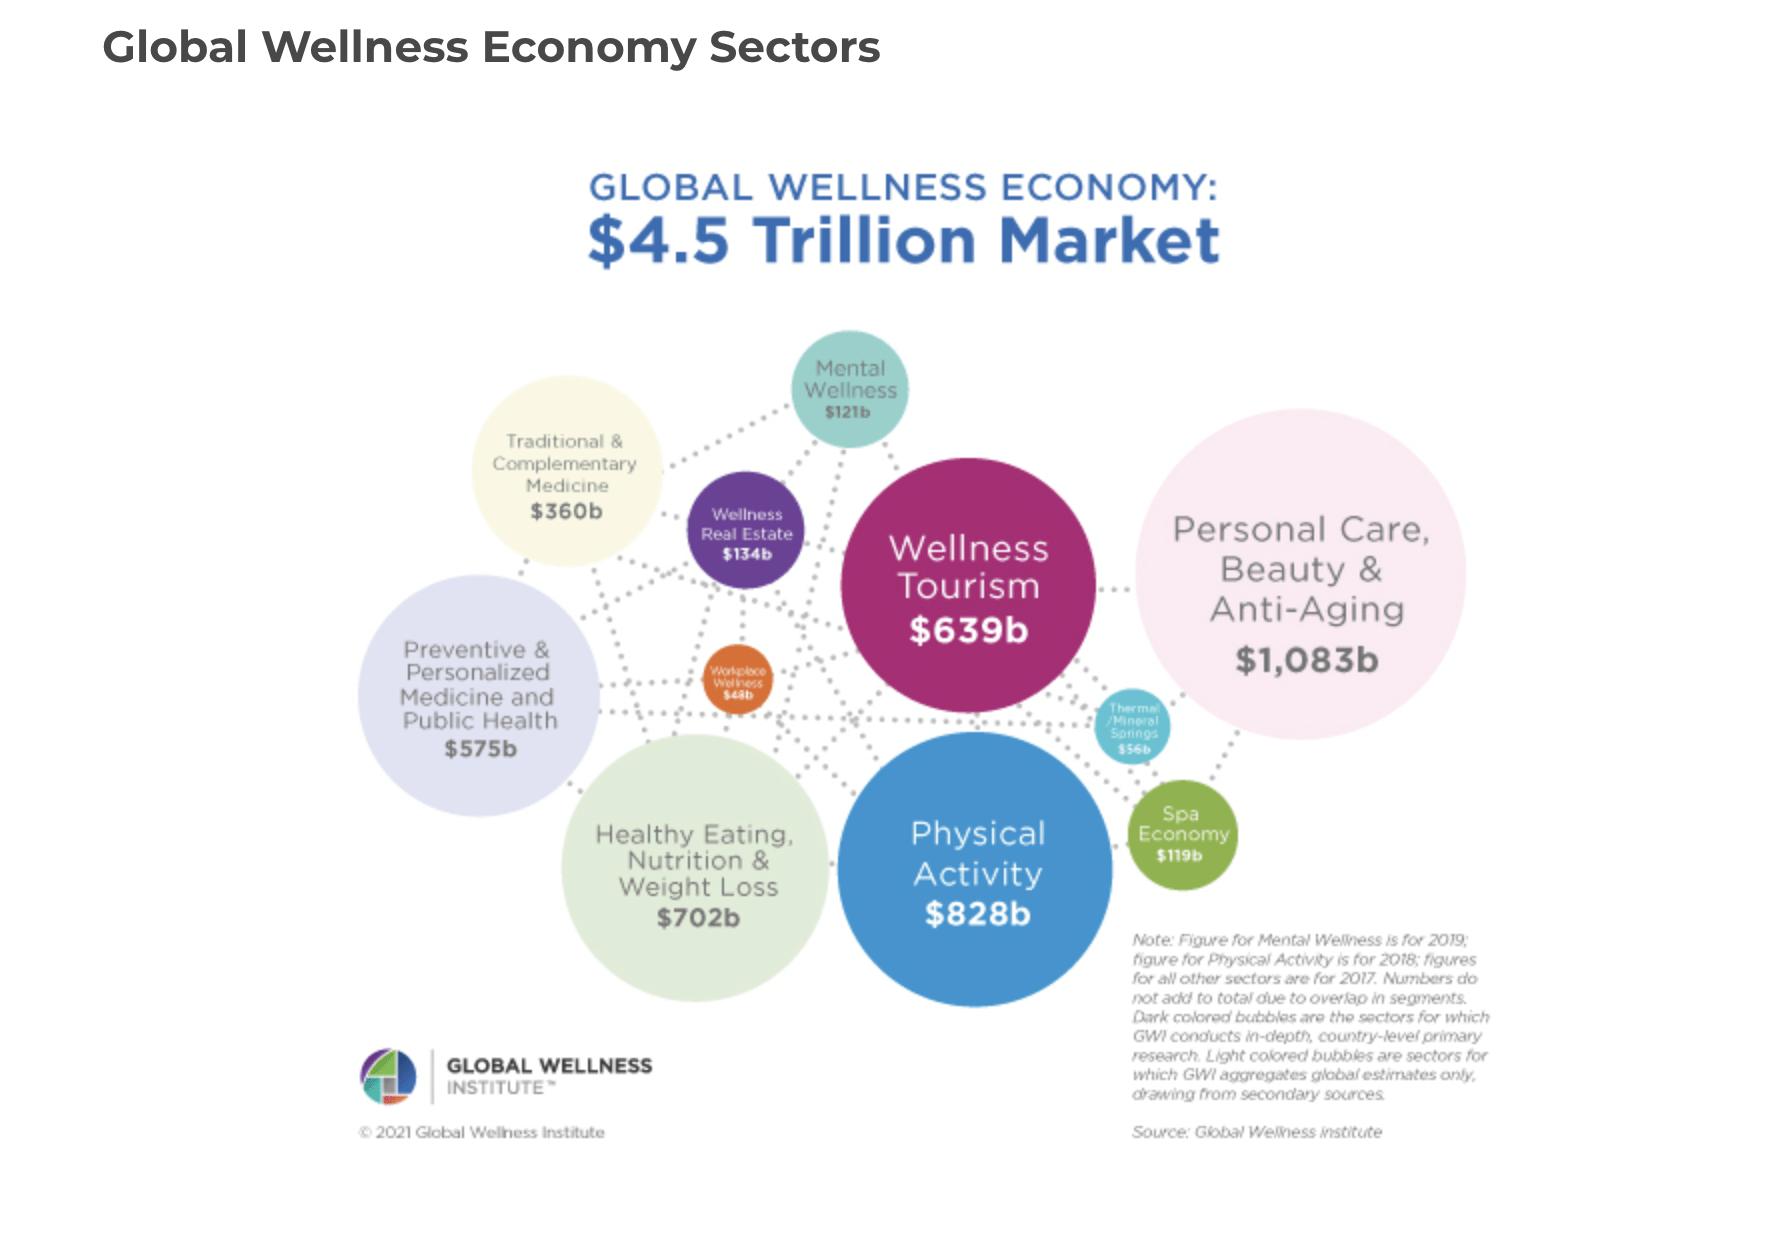 ABC Hospitality-The Wellness Economy is Already Here